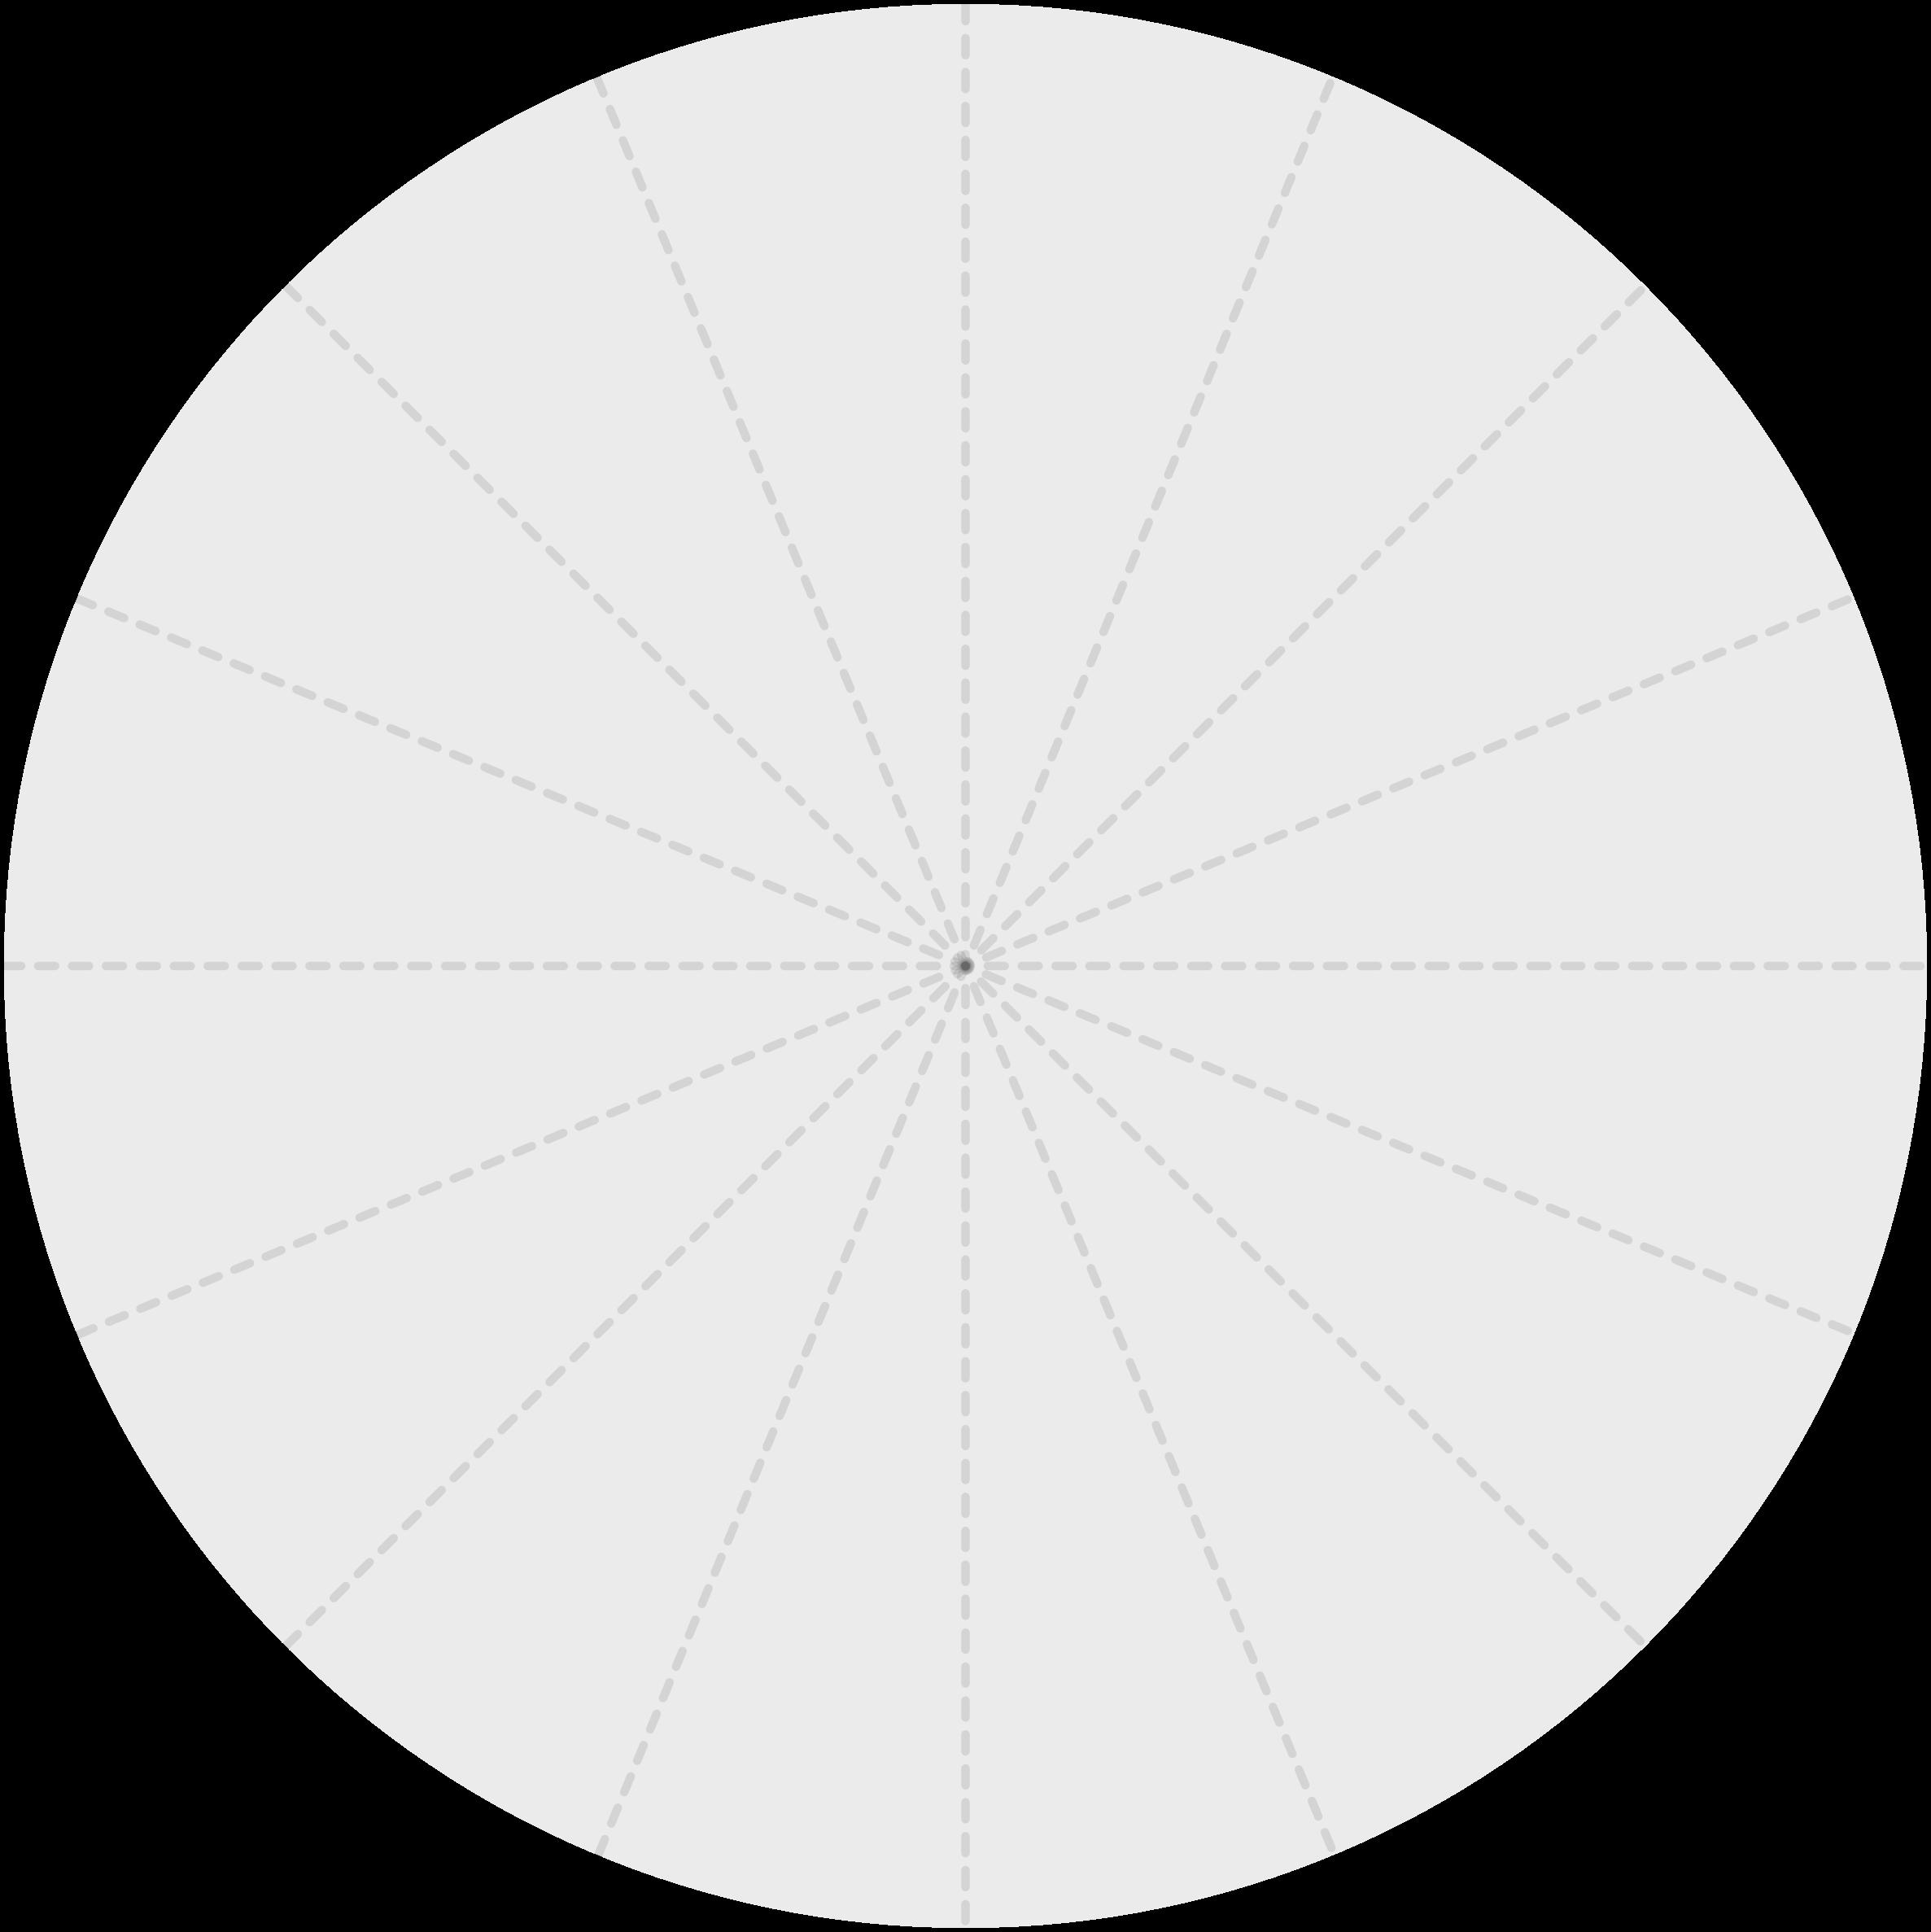 Party Cheesecake 20cm diameter, 4cm high, 975g weight